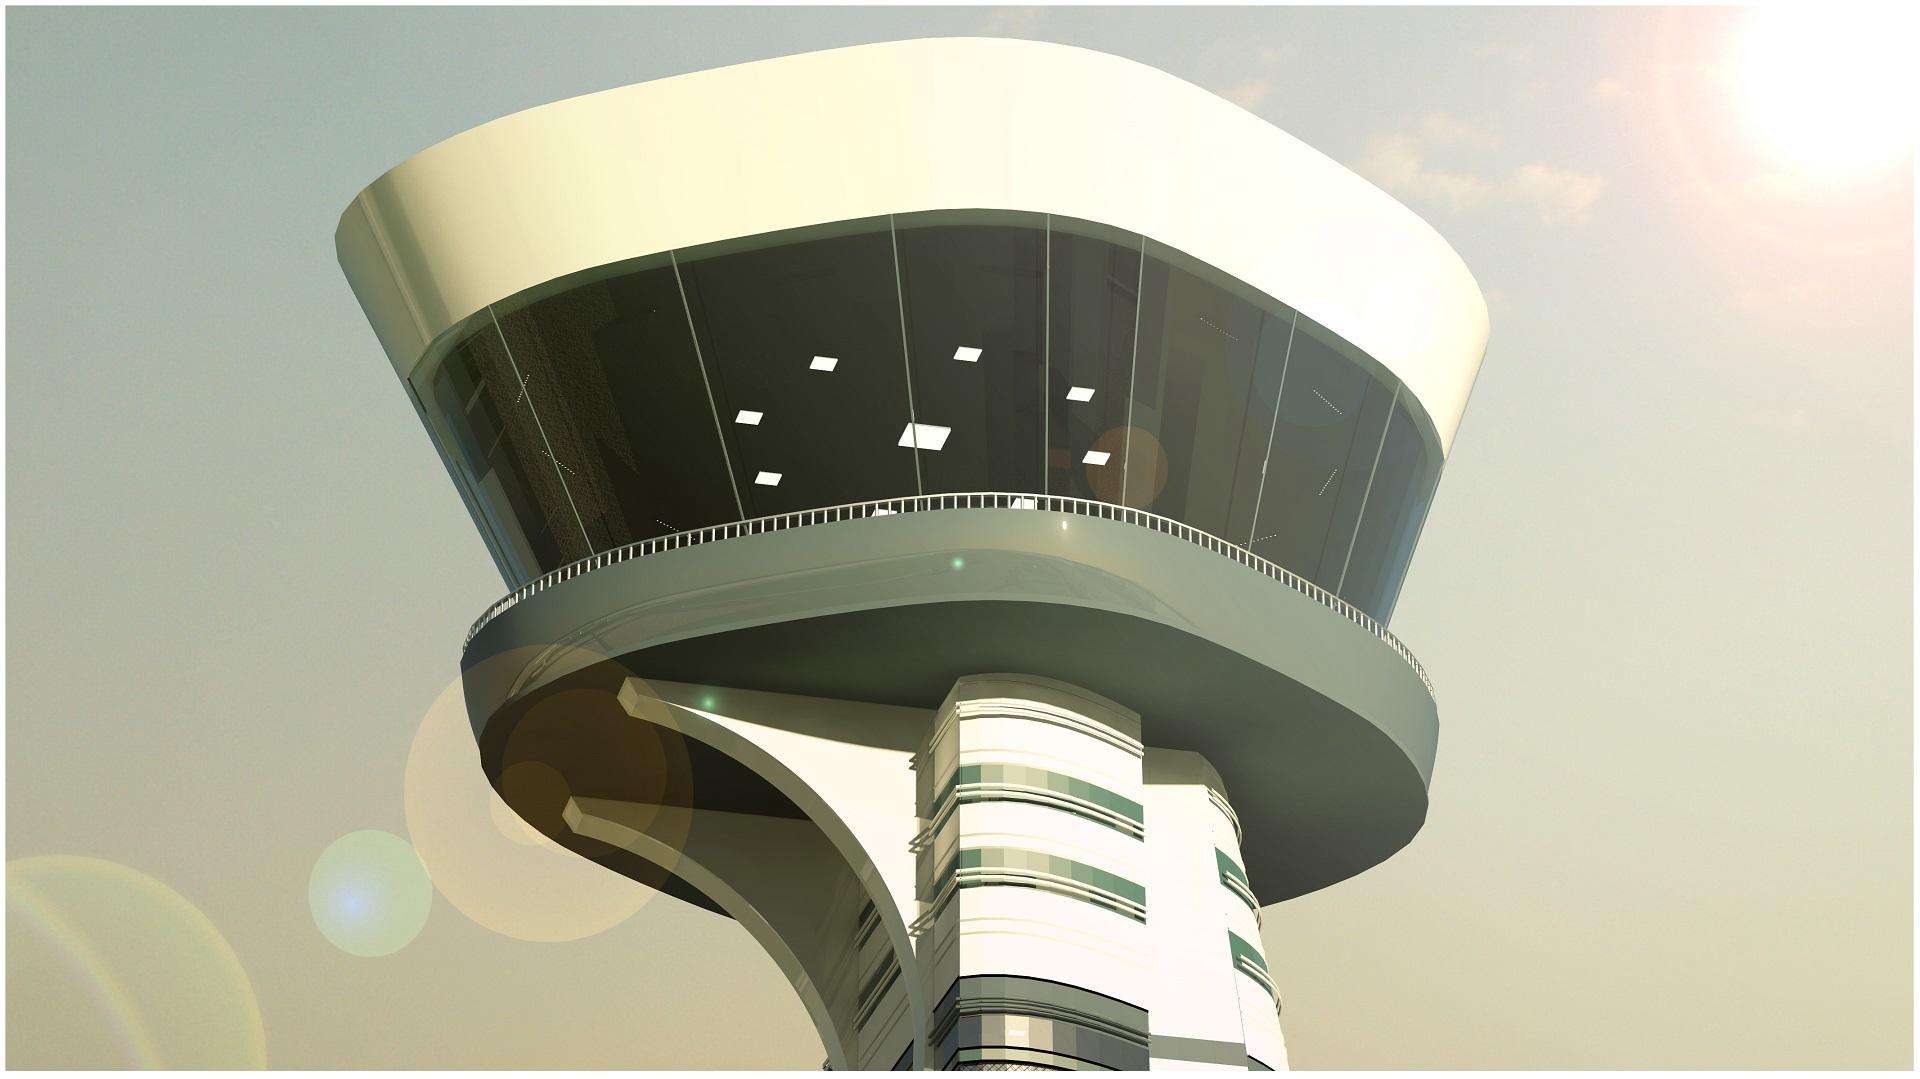 FIA Control Room